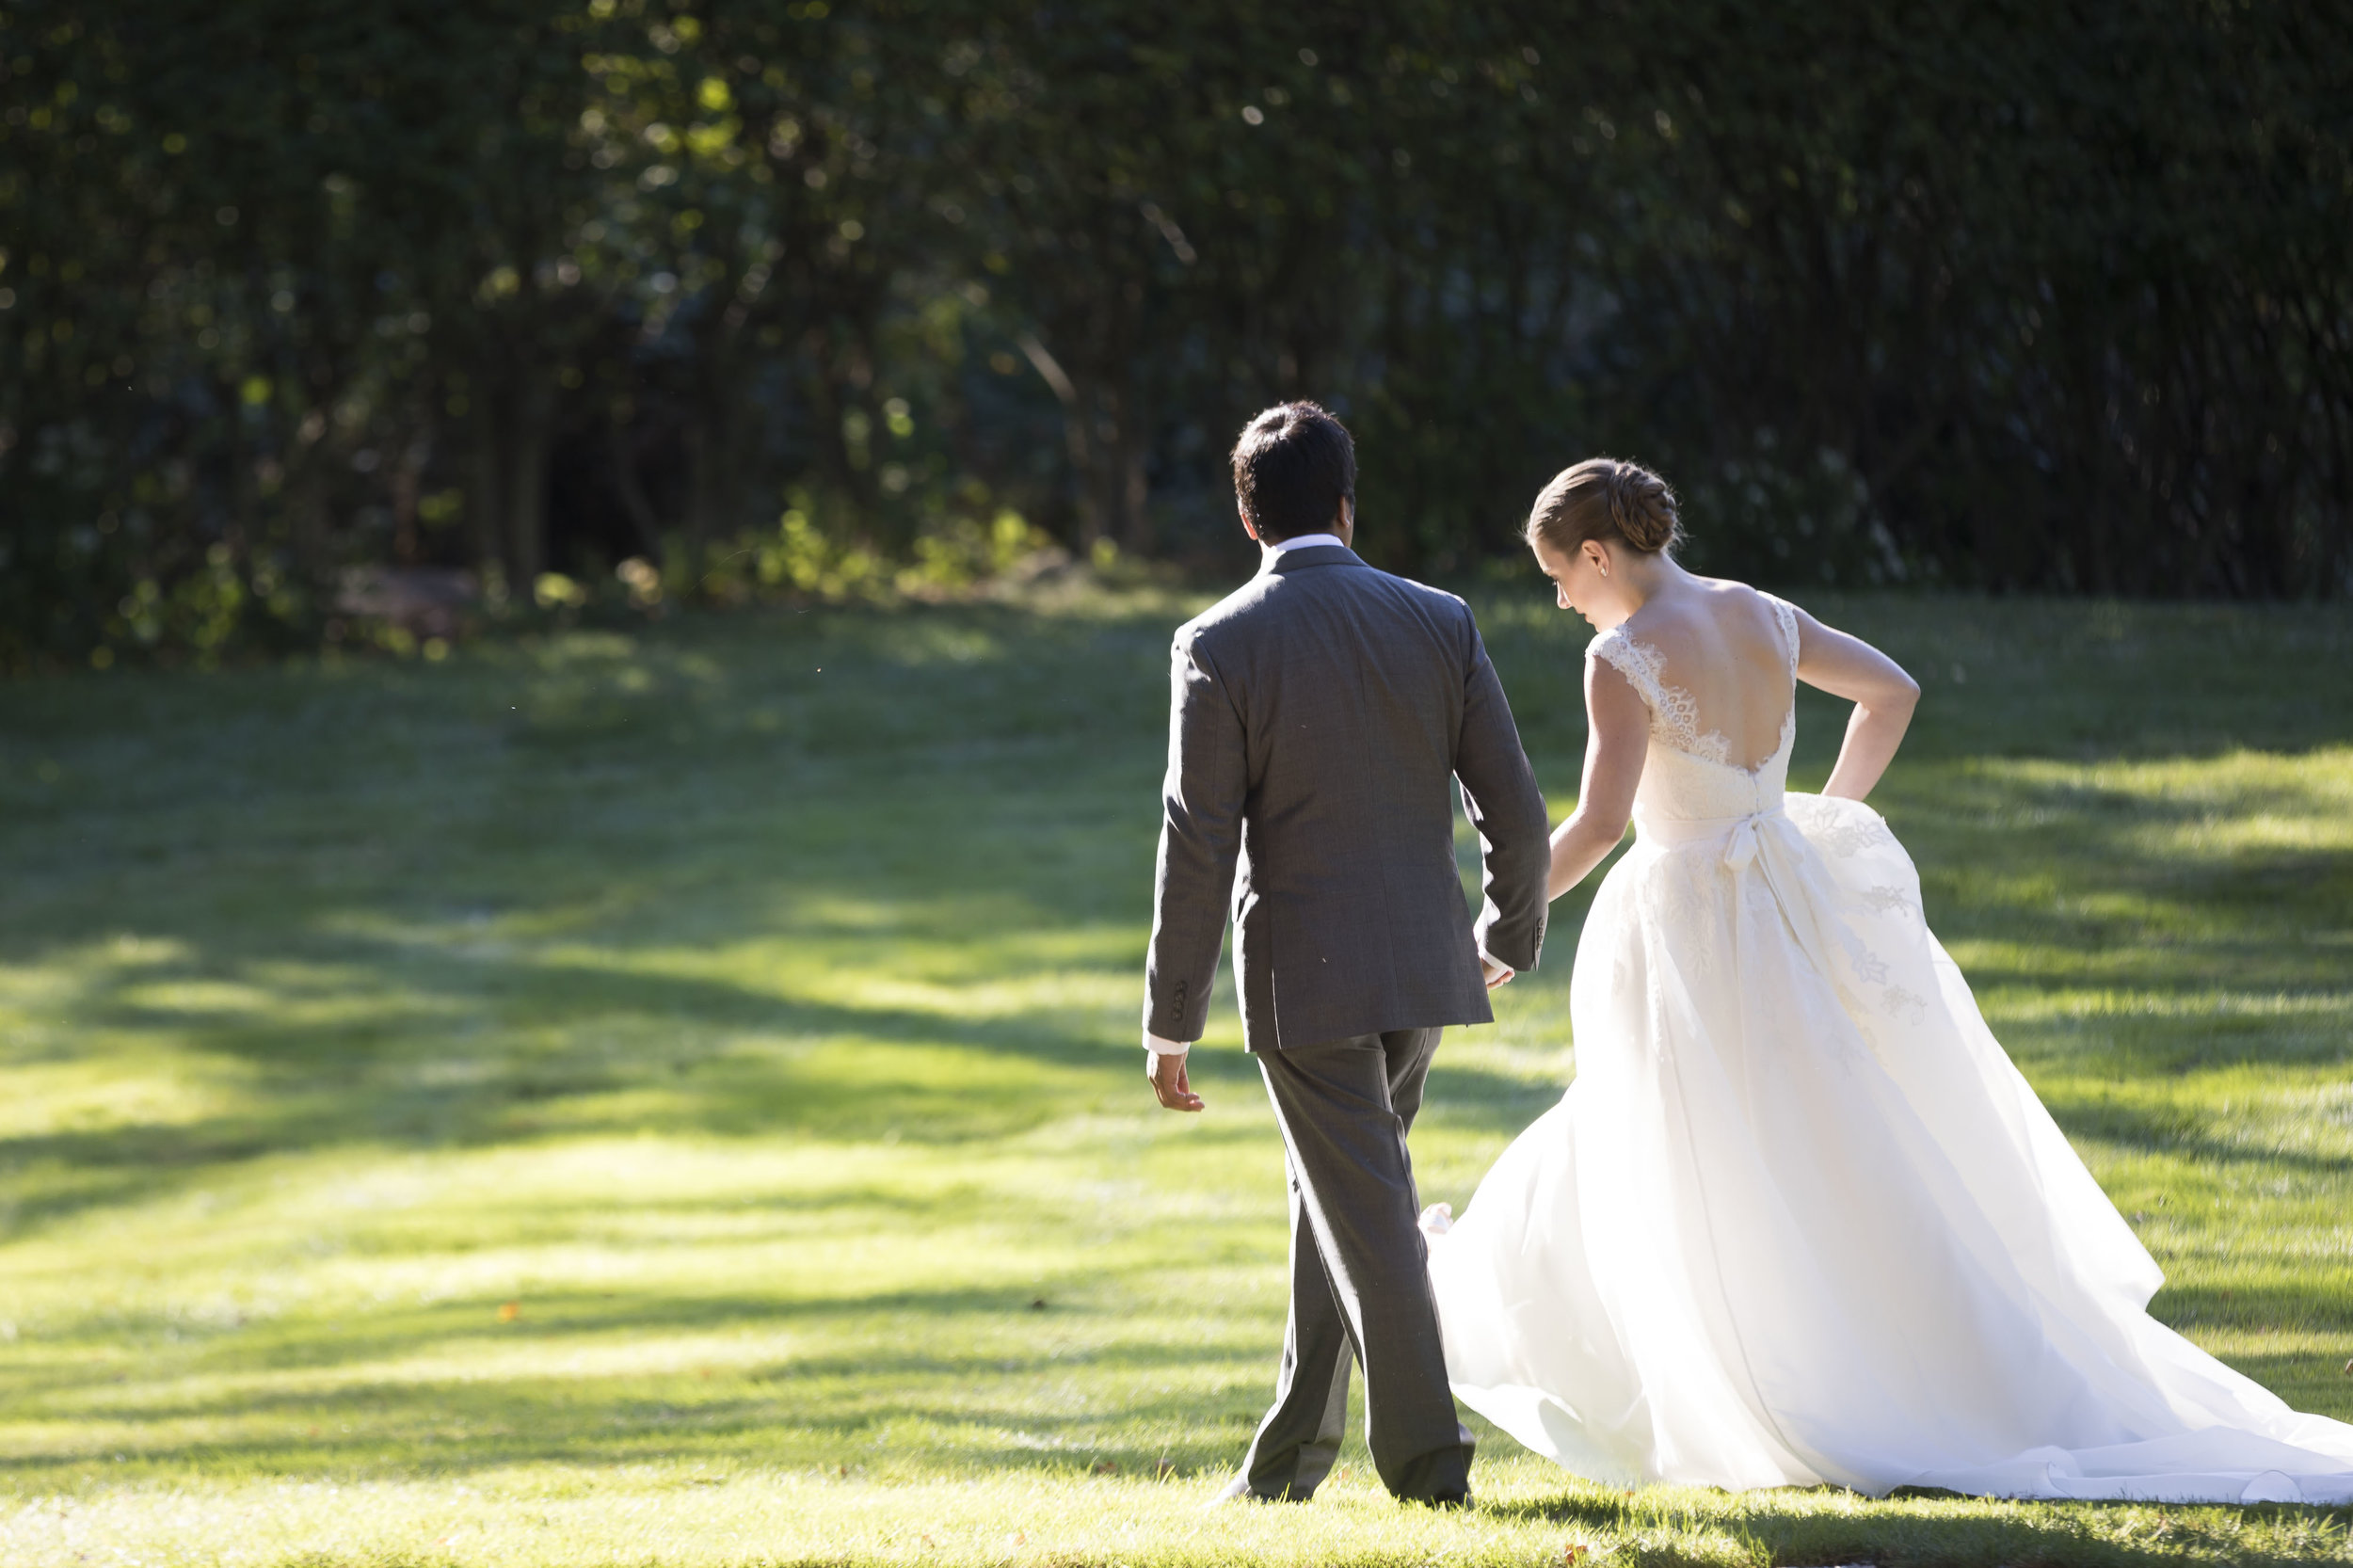 Tappan-Hill-Wedding-Photographer-0028.JPG